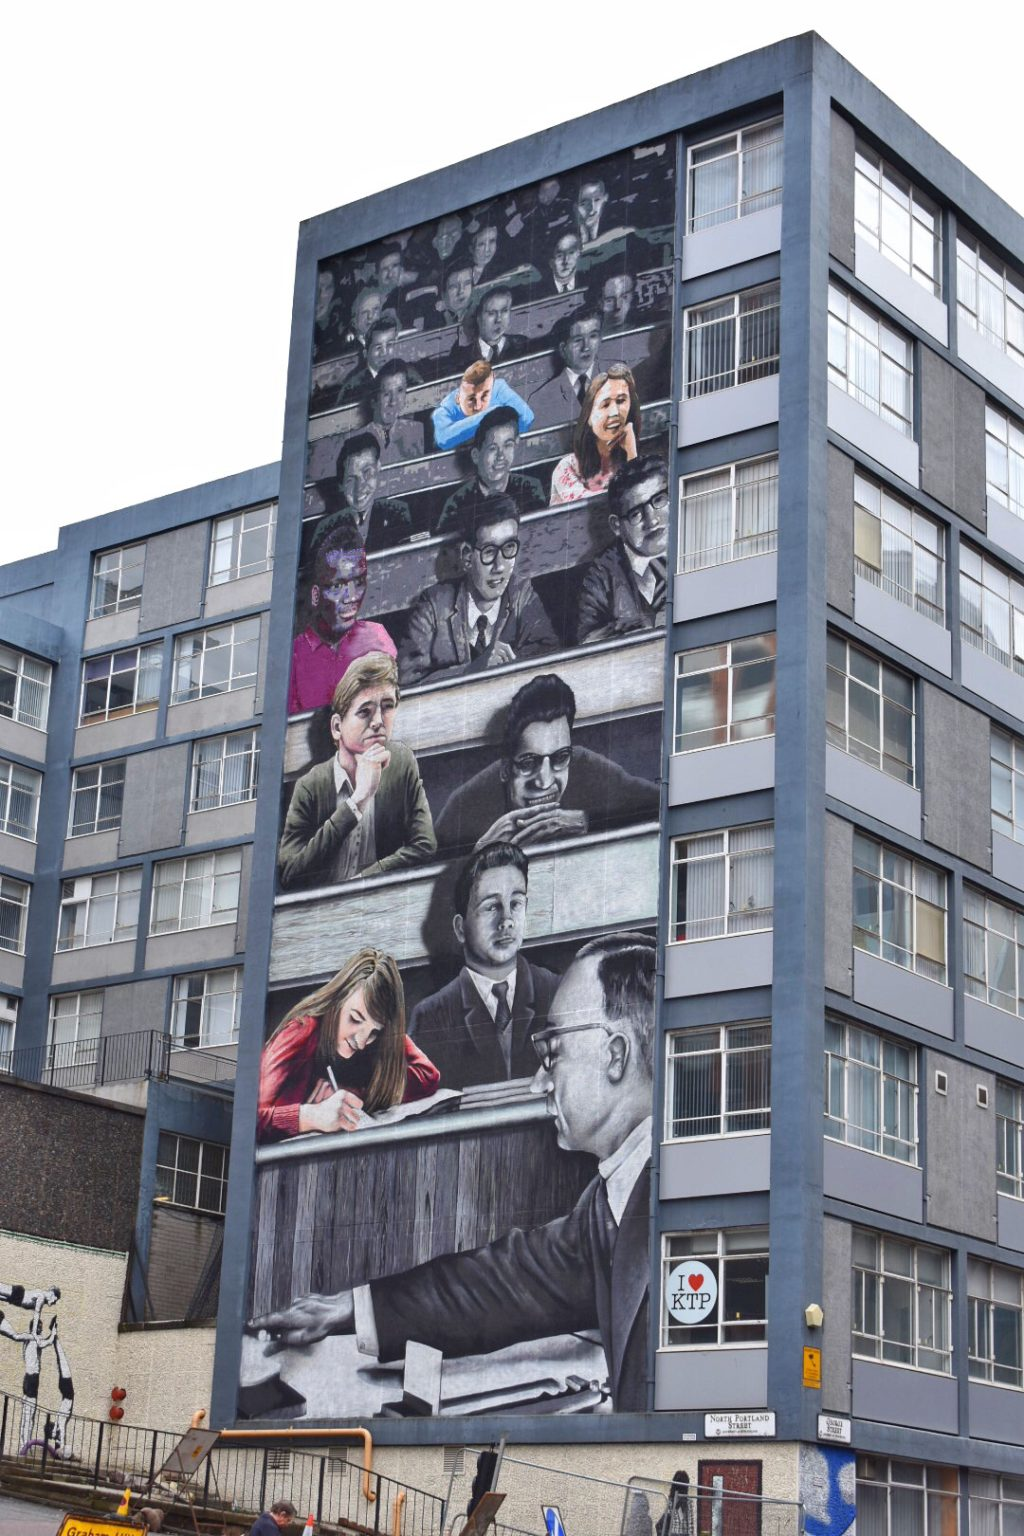 Glasgow Street Art Scotland, Strathclyde University Wonderwall Mural